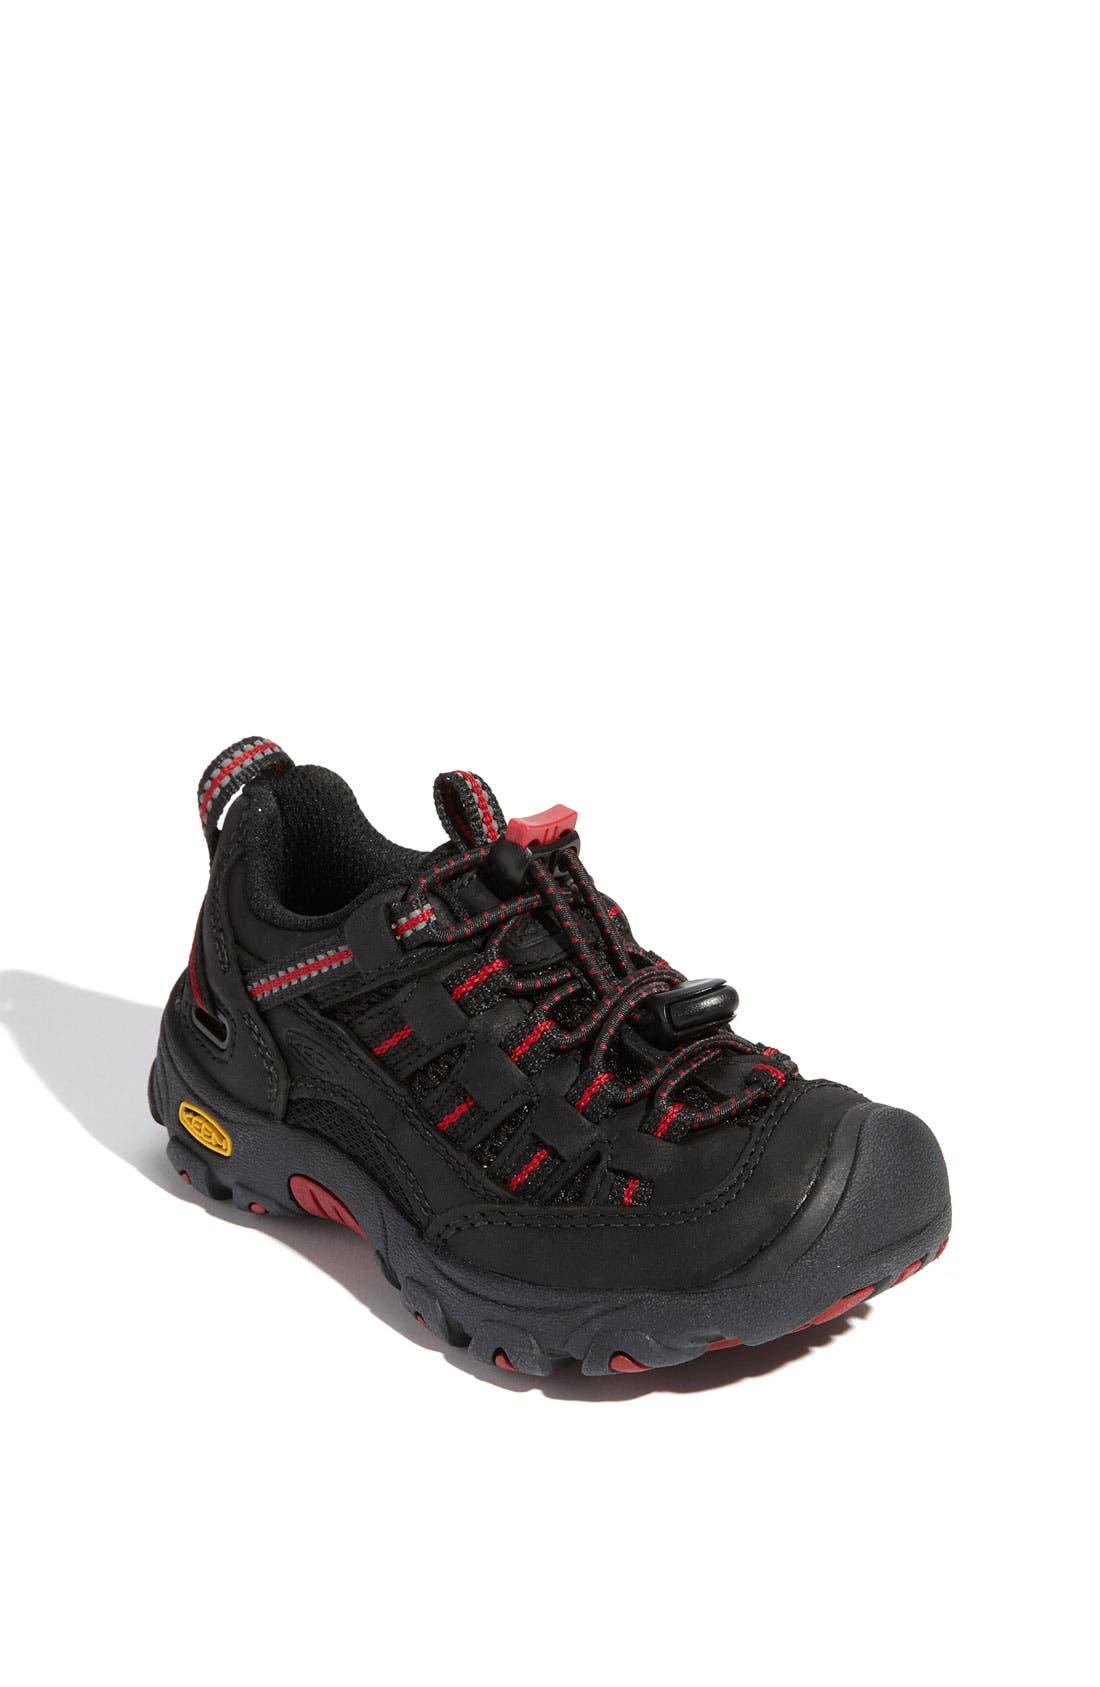 Alternate Image 1 Selected - Keen 'Alamosa' Sneaker (Toddler, Little Kid & Big Kid)